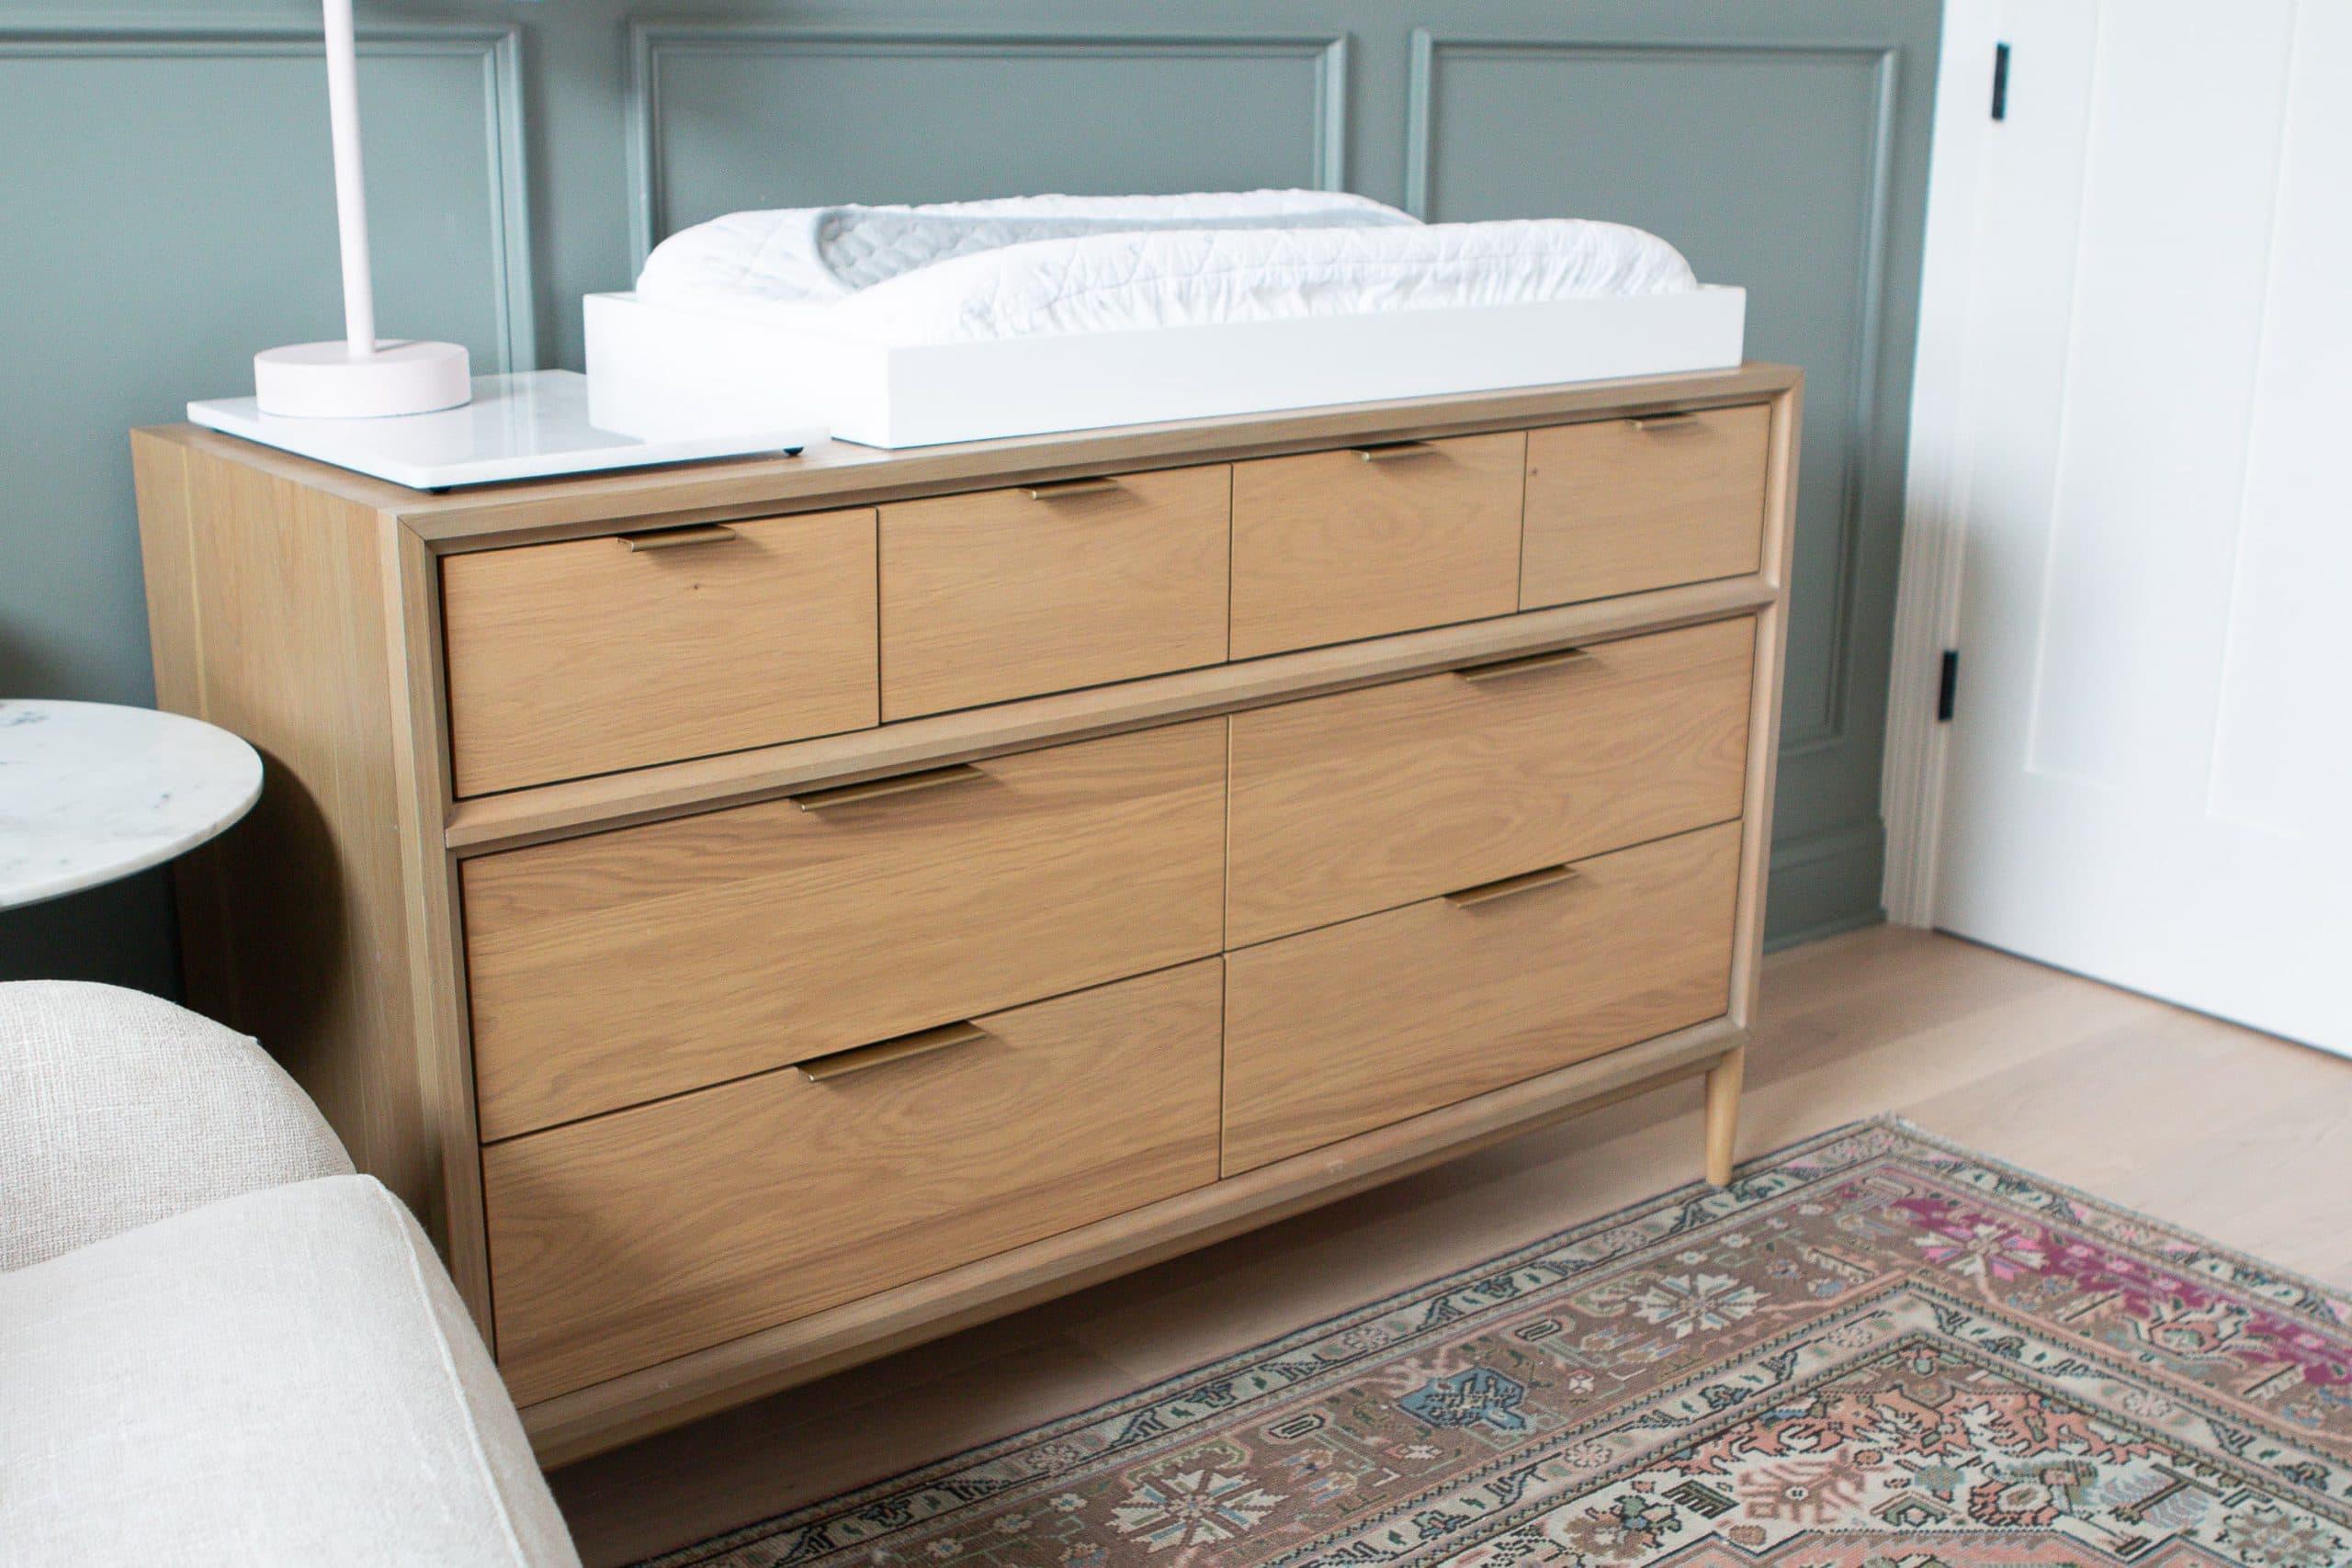 Rory's nursery dresser organization